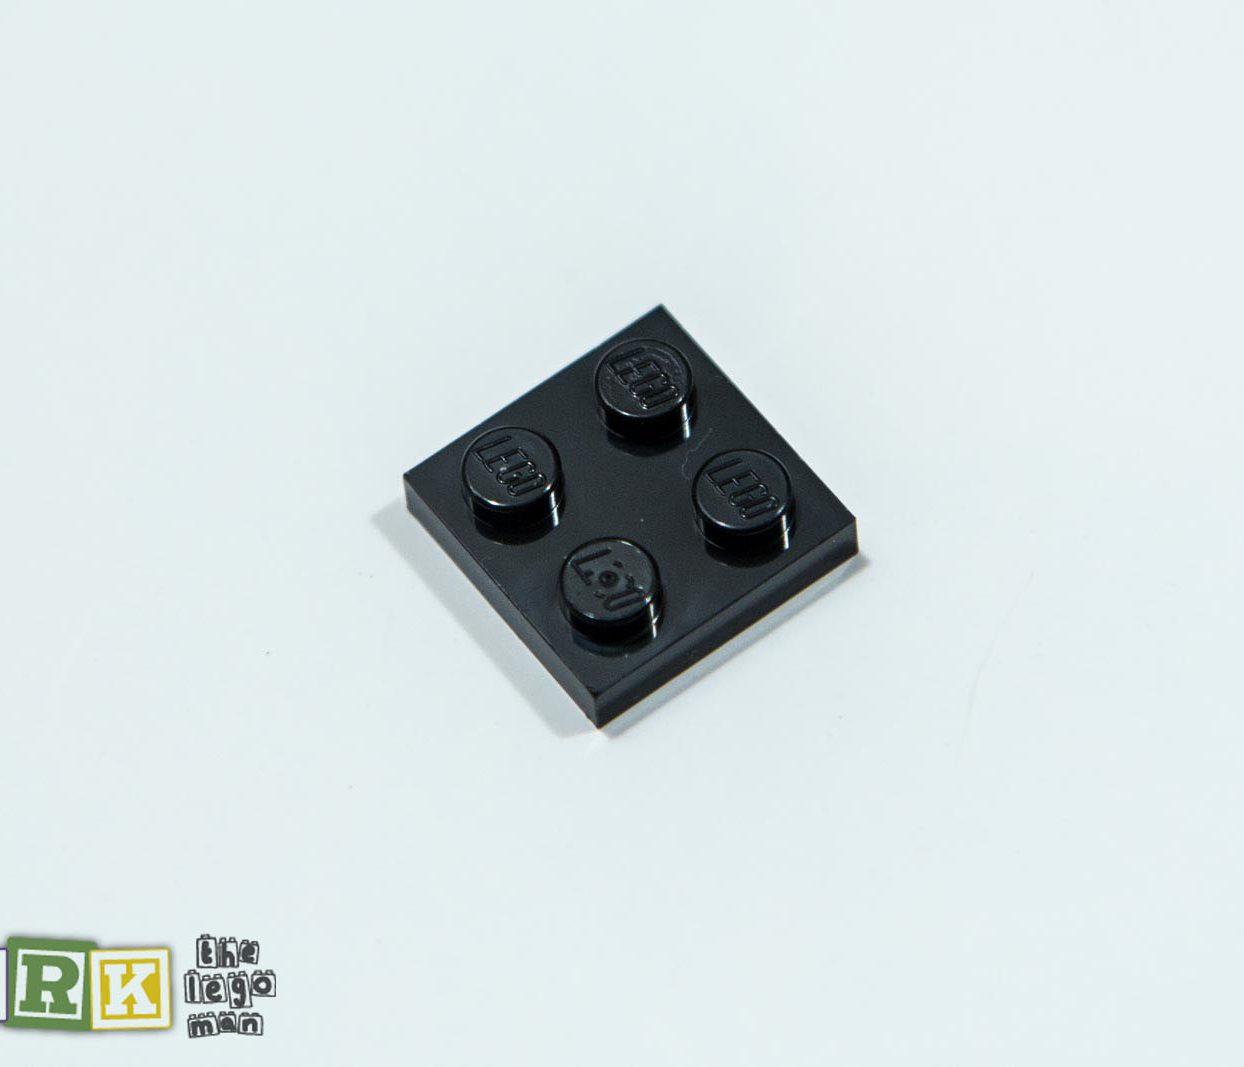 NEW Lego 302226 3022 1x Black 2x2 Plate 2X2